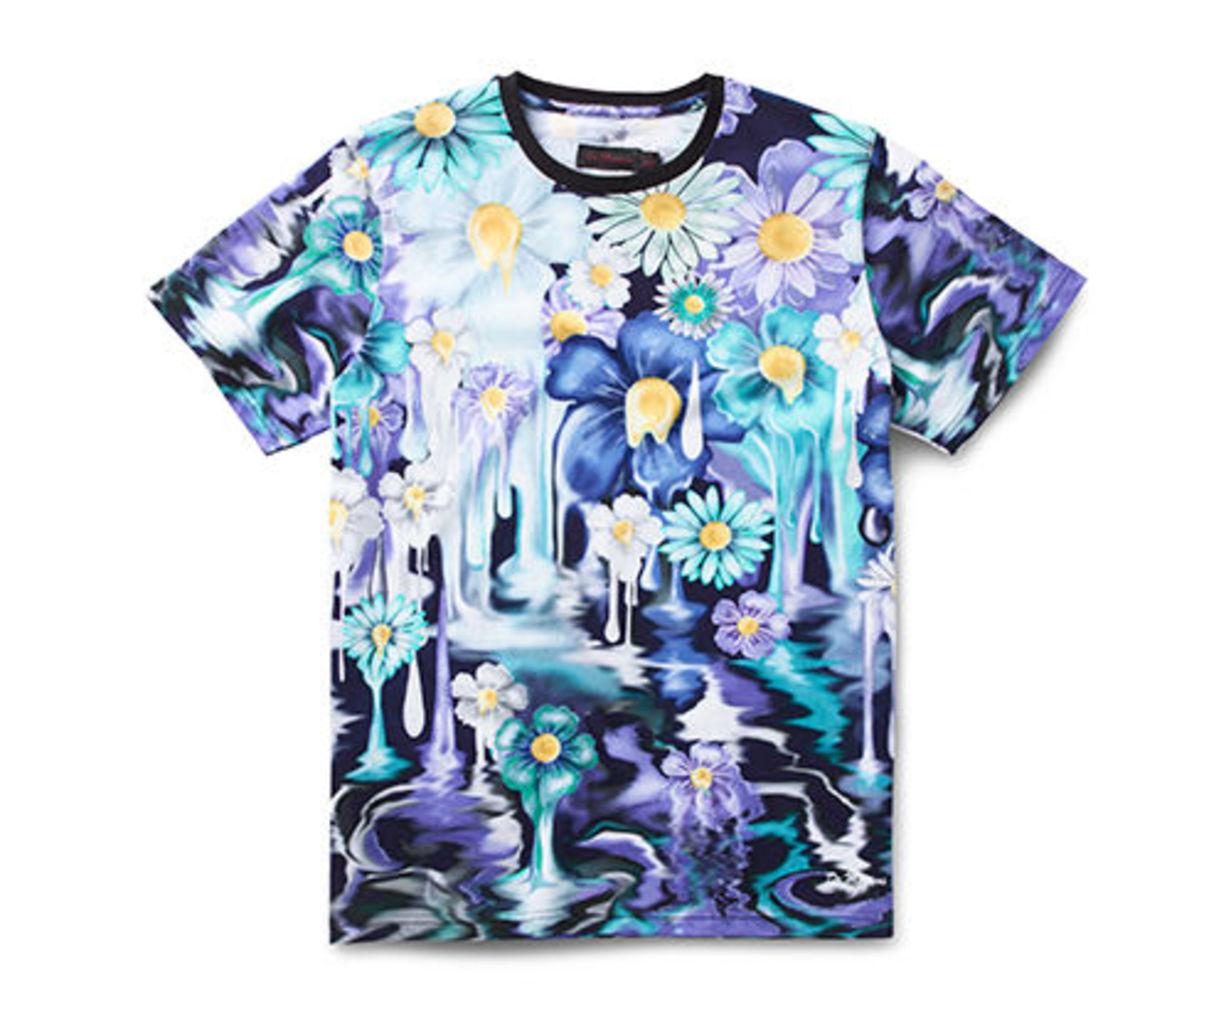 Paint Slick T-Shirt